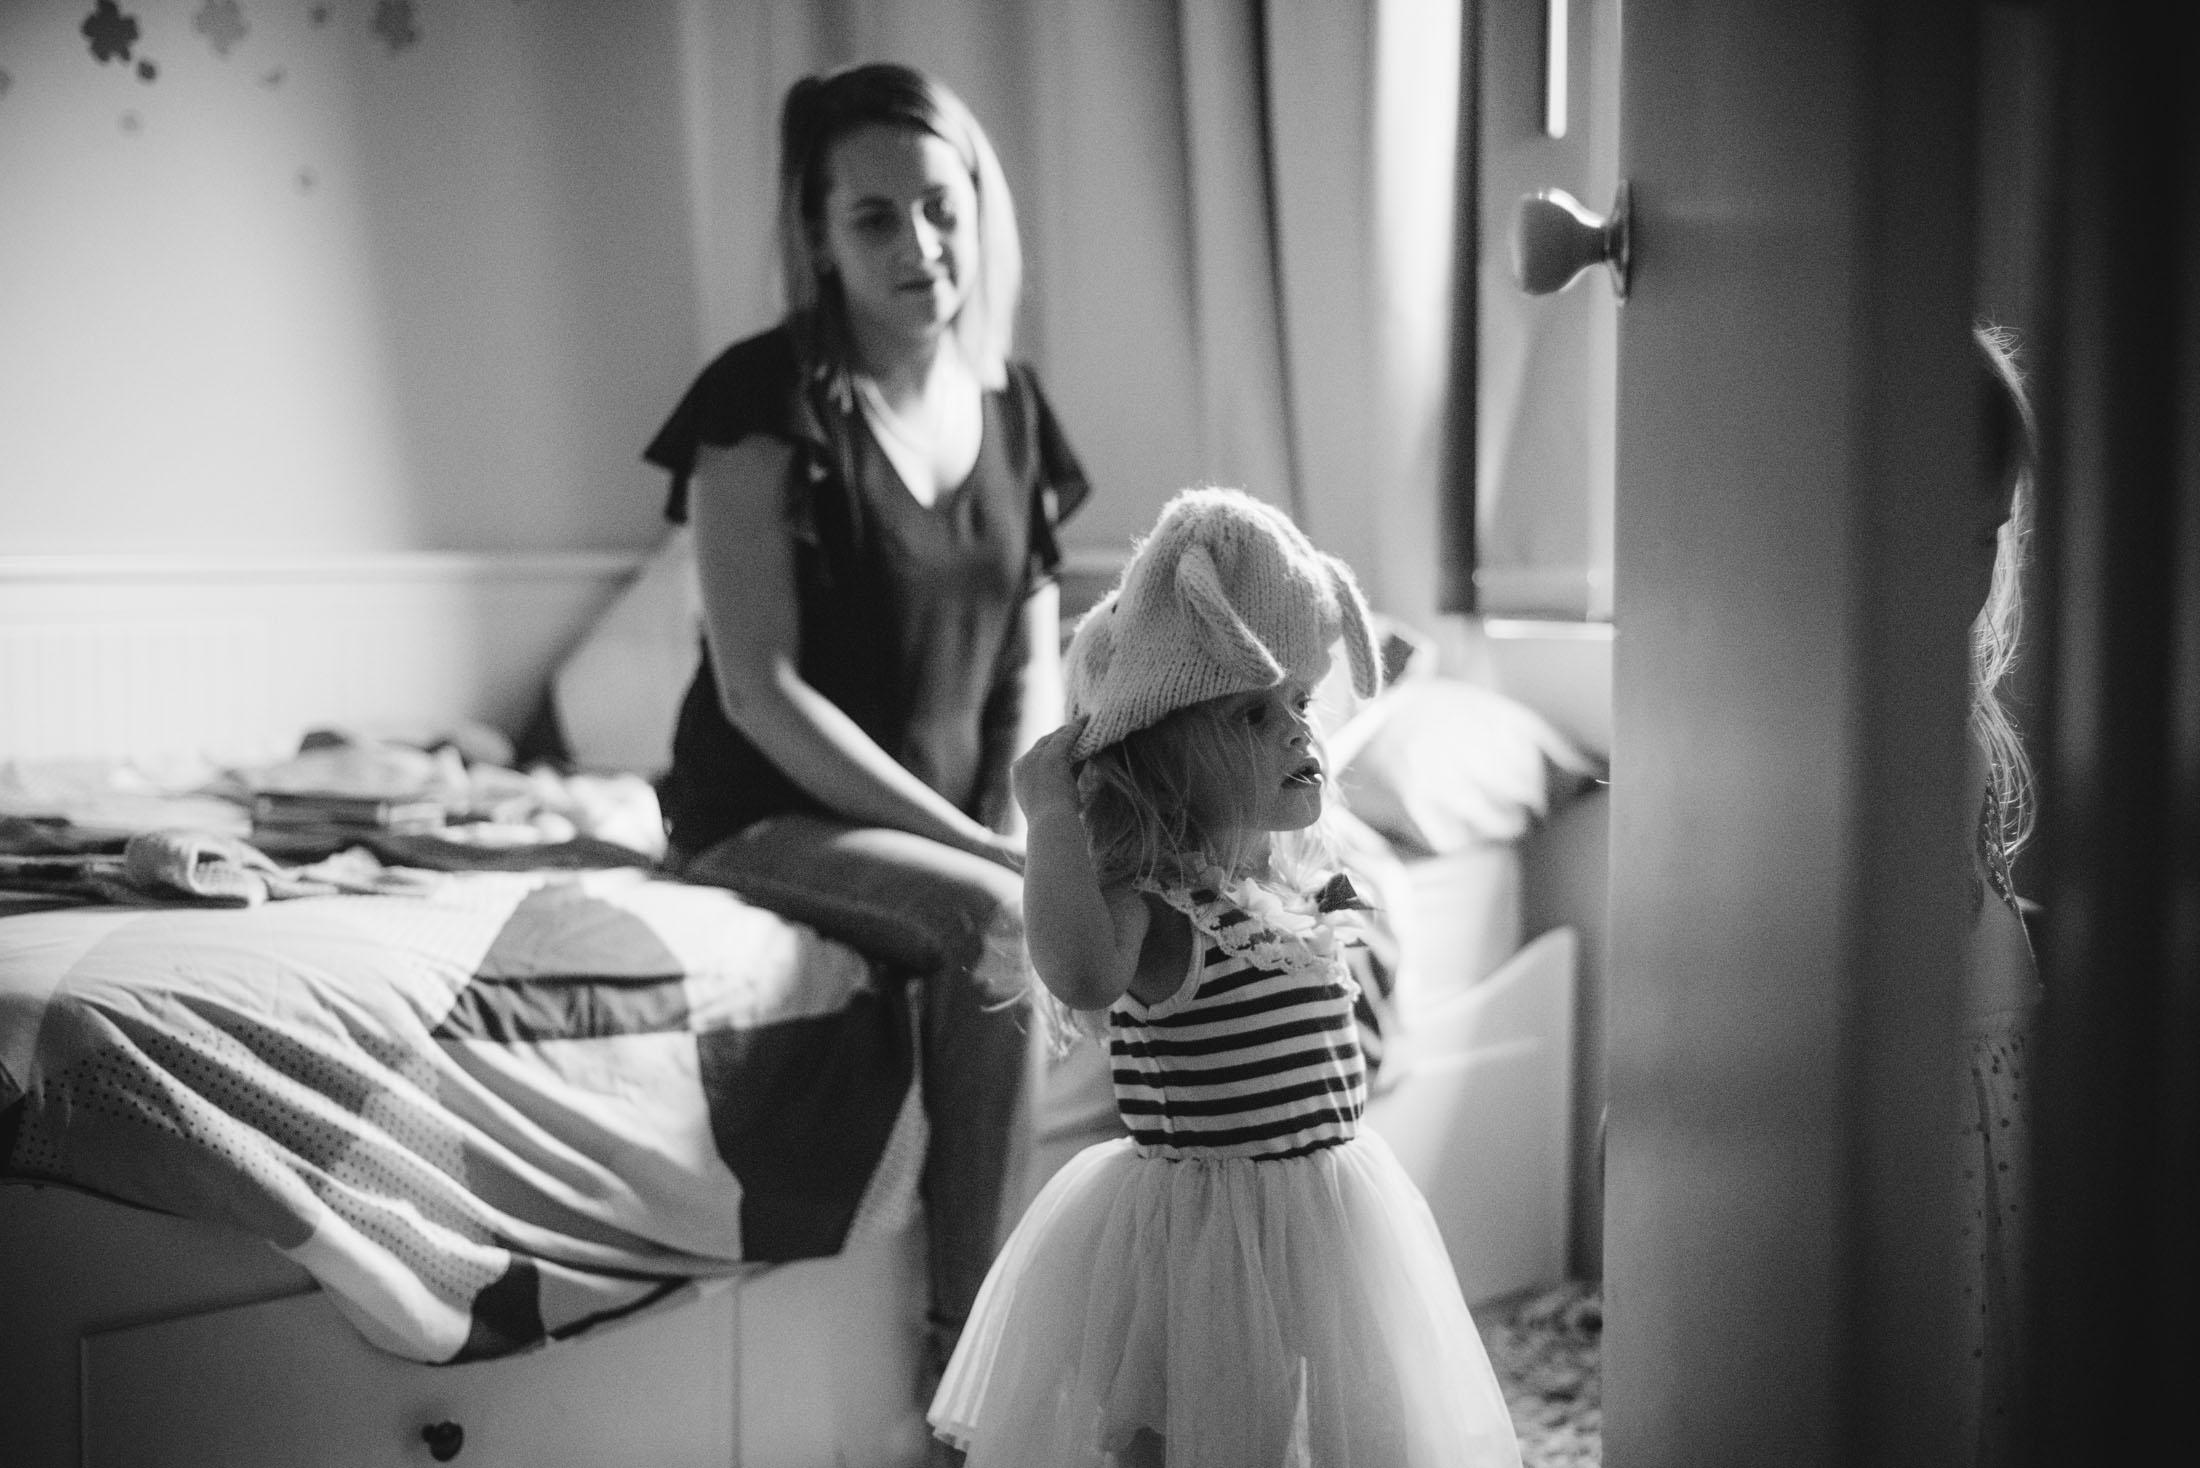 Sach_Family-Photography-unposed03.JPG